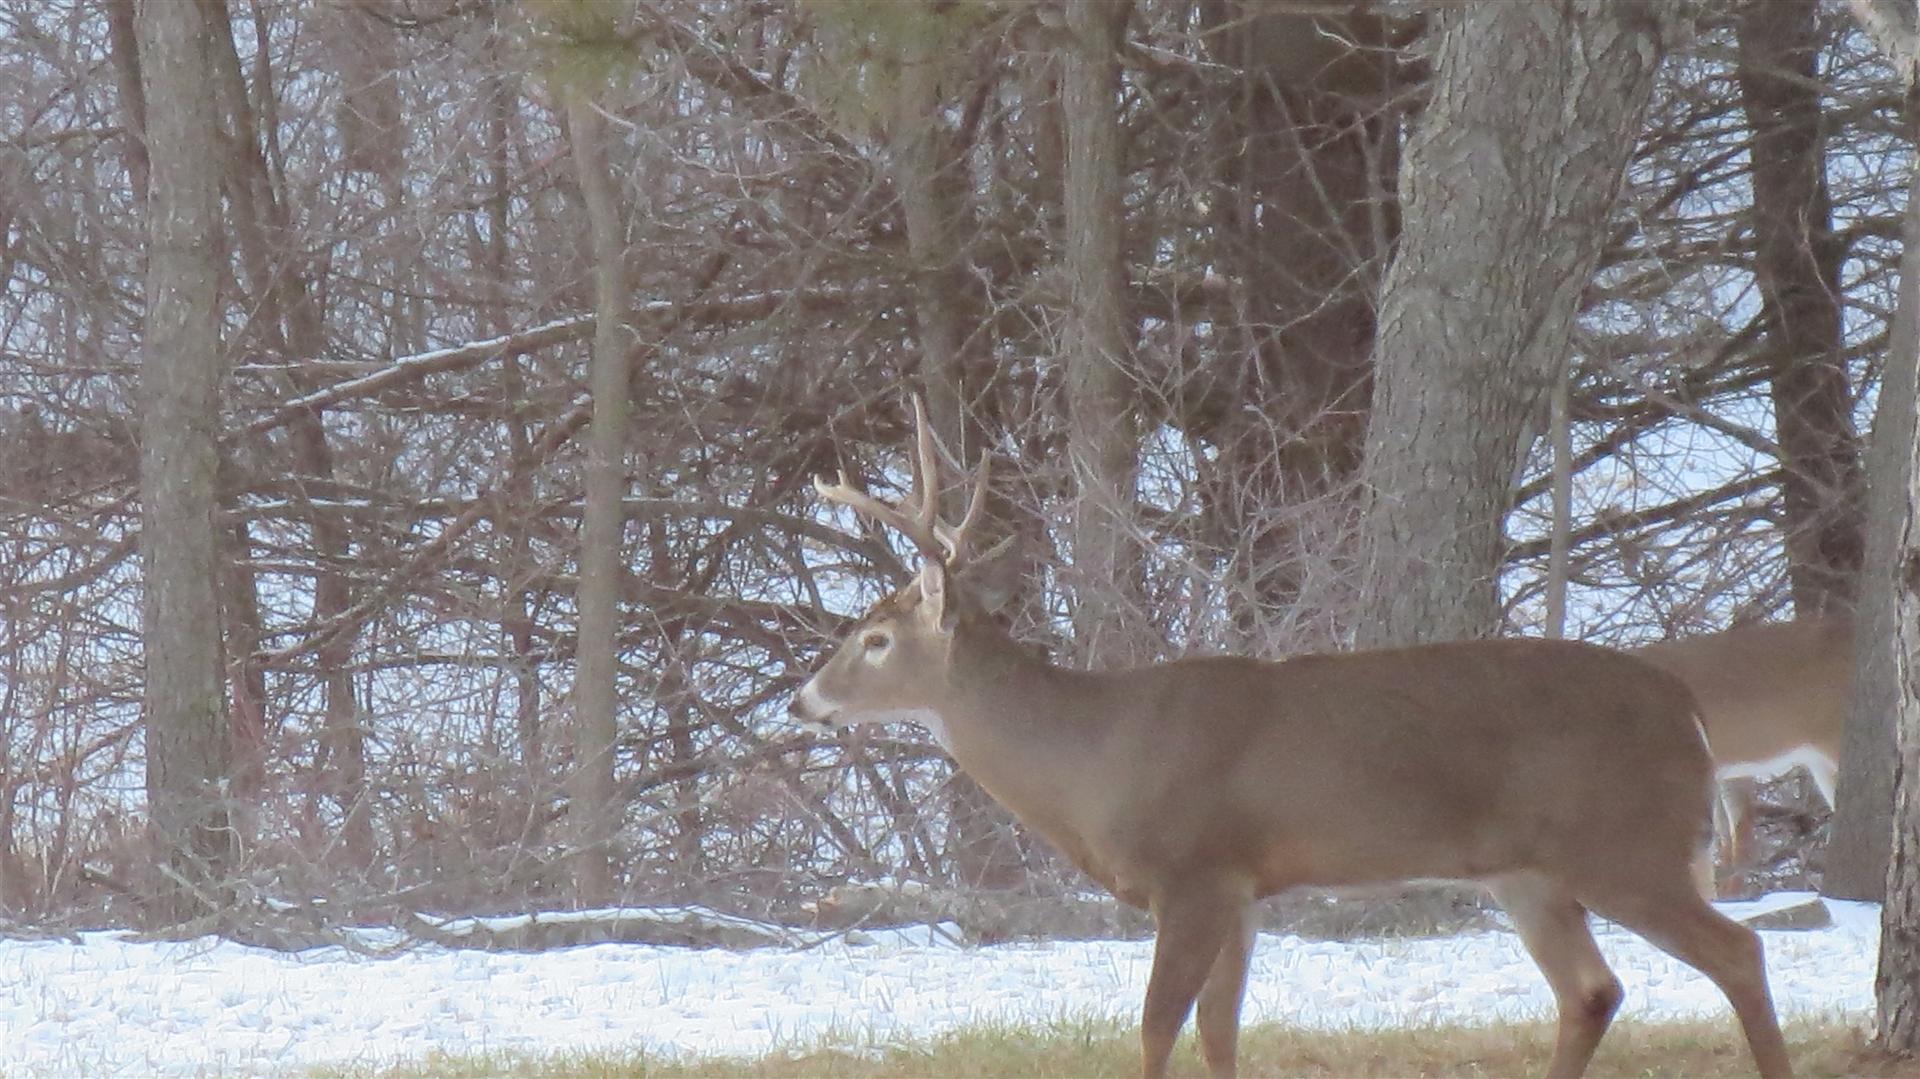 Buck Standing In Back Yard - Antlers